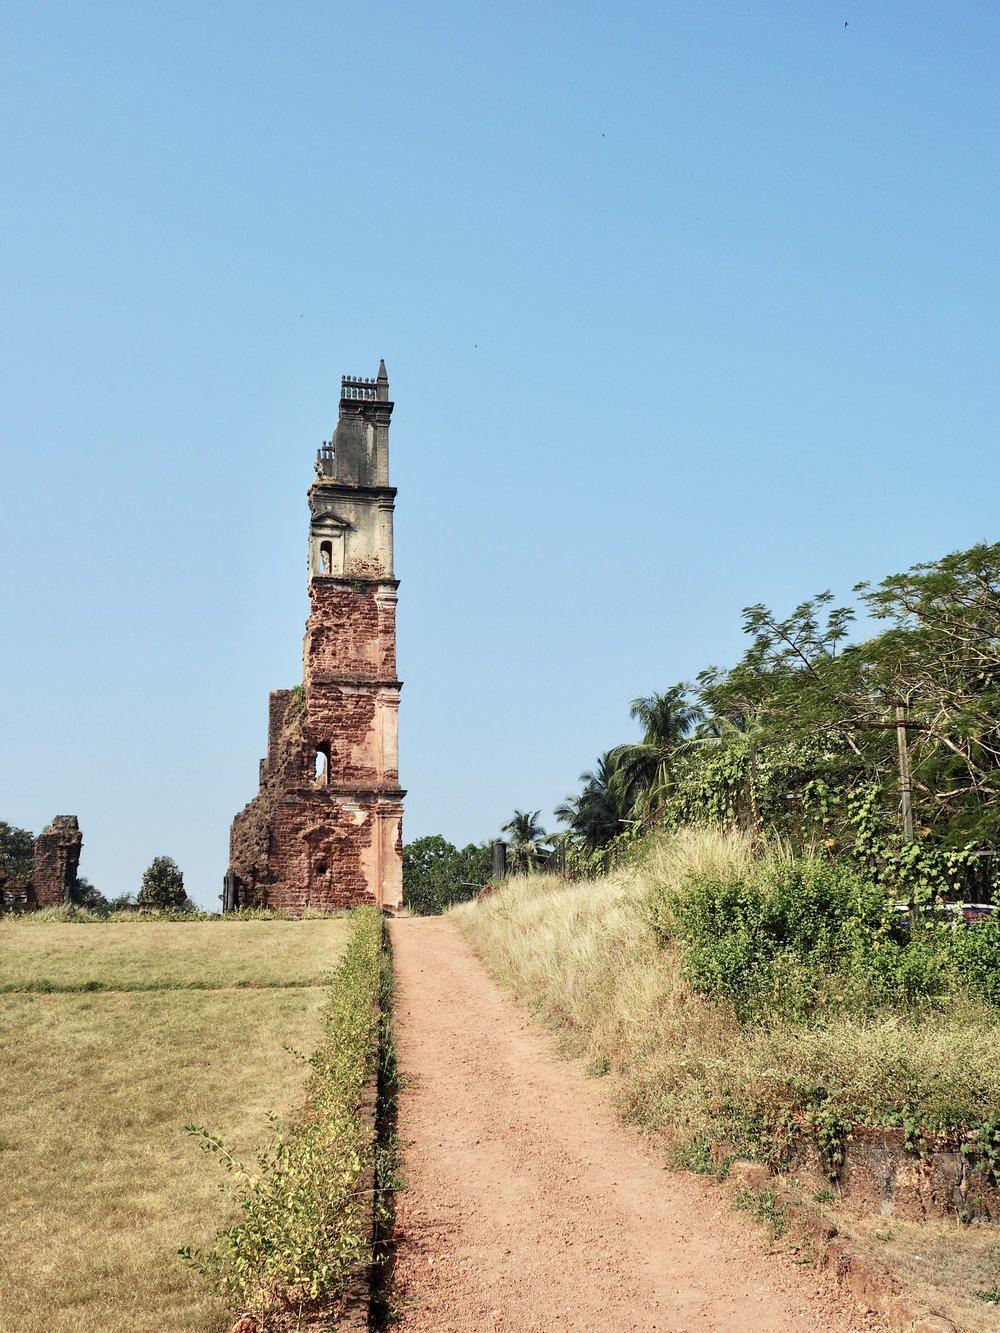 St Augustine Tower